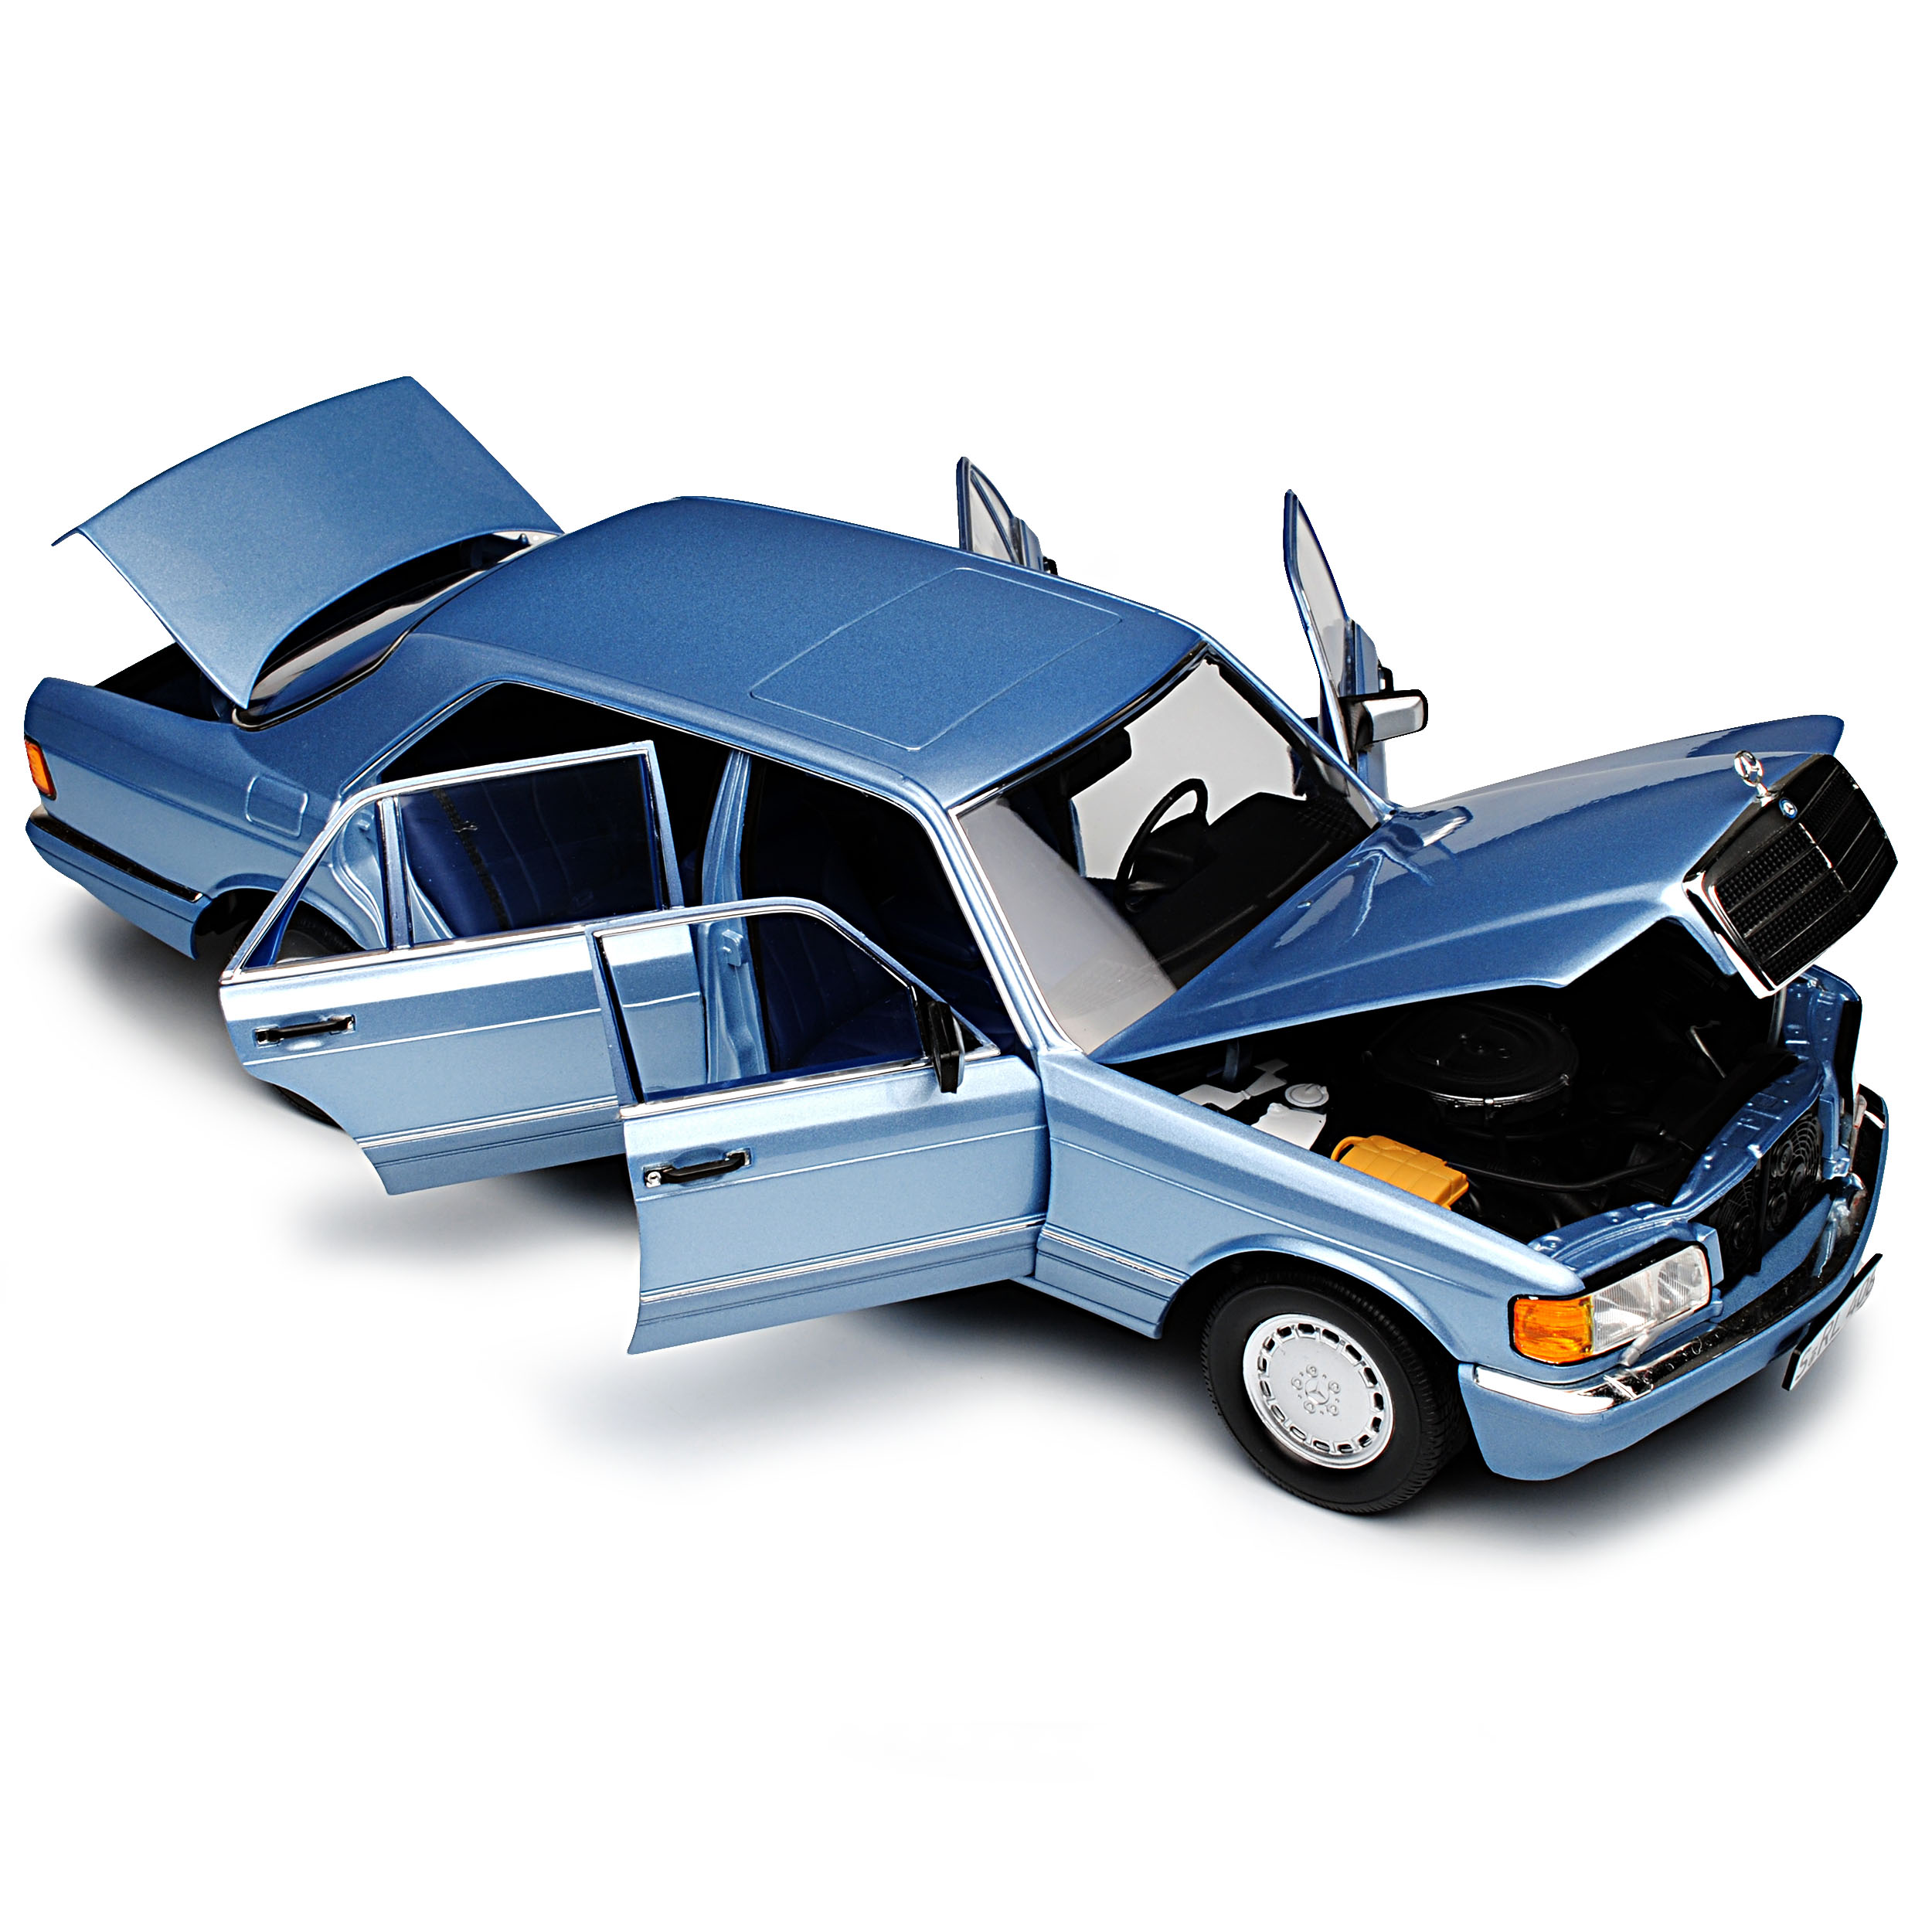 Mercedes-Benz 560 SEL S-Class Bright Blue Metallic W126